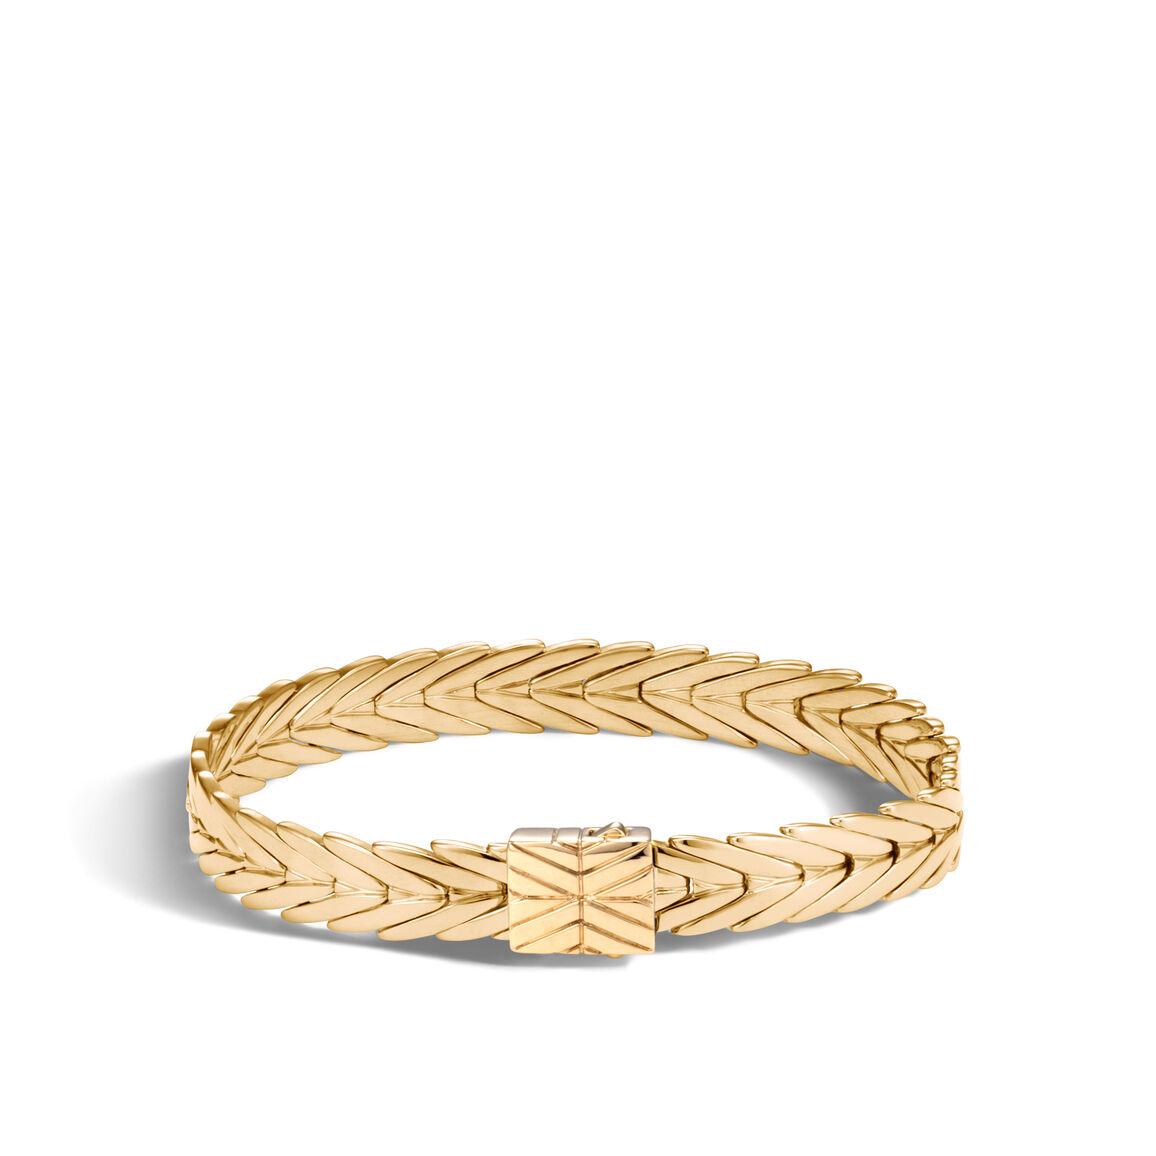 Modern Chain 8MM Bracelet in 18K Gold